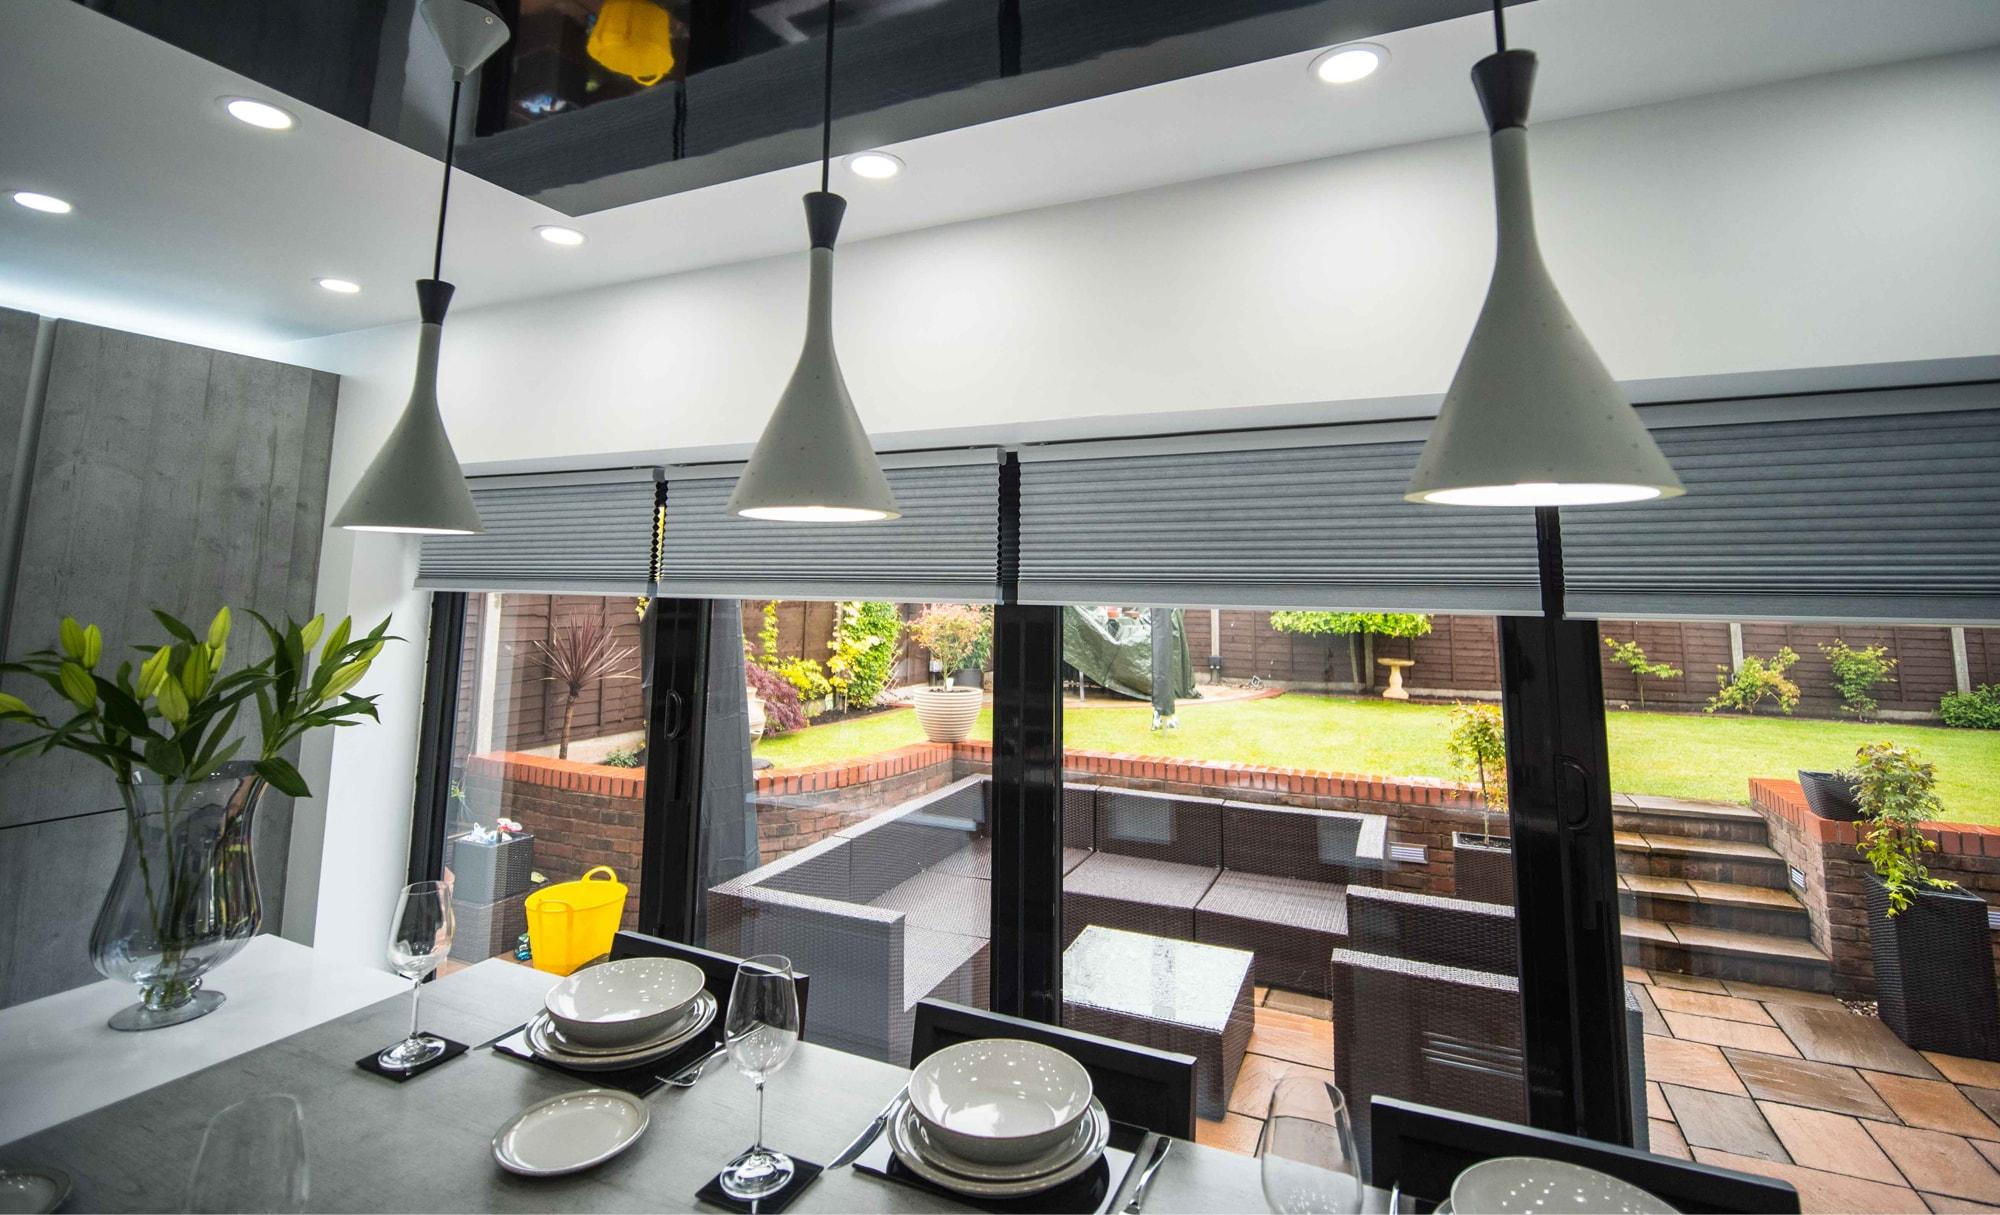 The Gallery Zola Gloss Dust Grey Kitchen Garden & Lighting